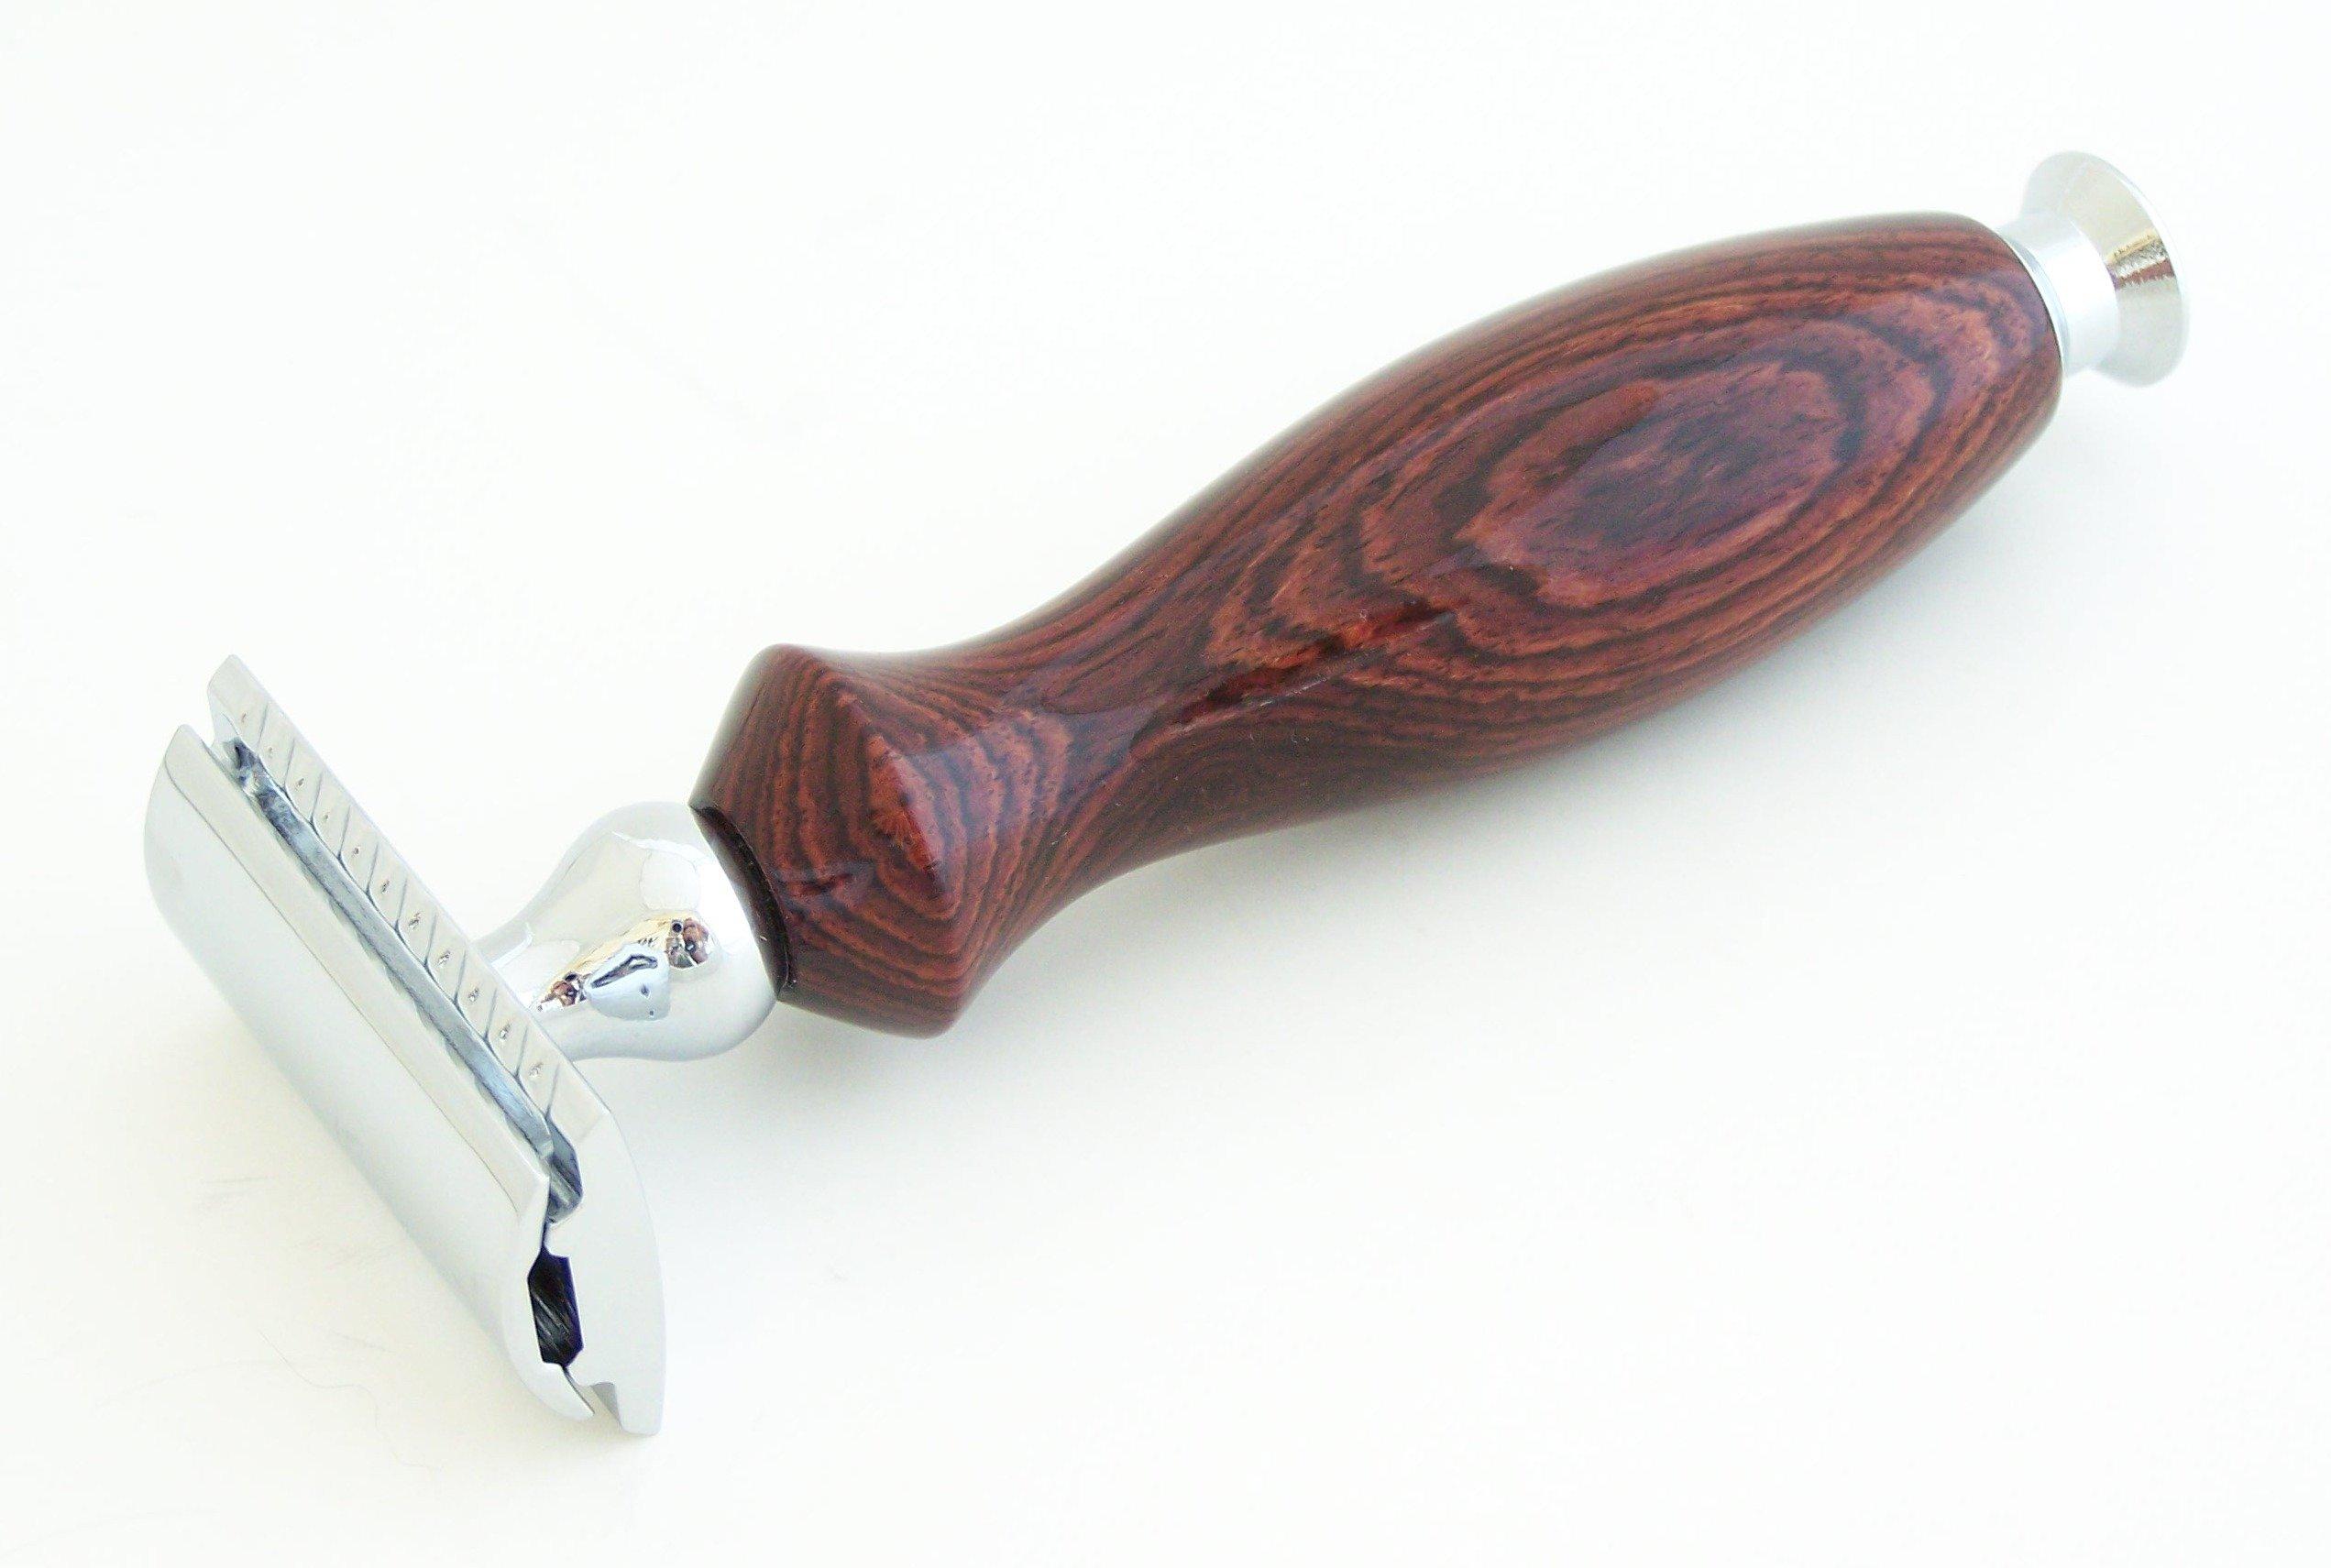 Camatillo Rosewood DE (Double Edge) Safety Razor Shaving Handle (C1)